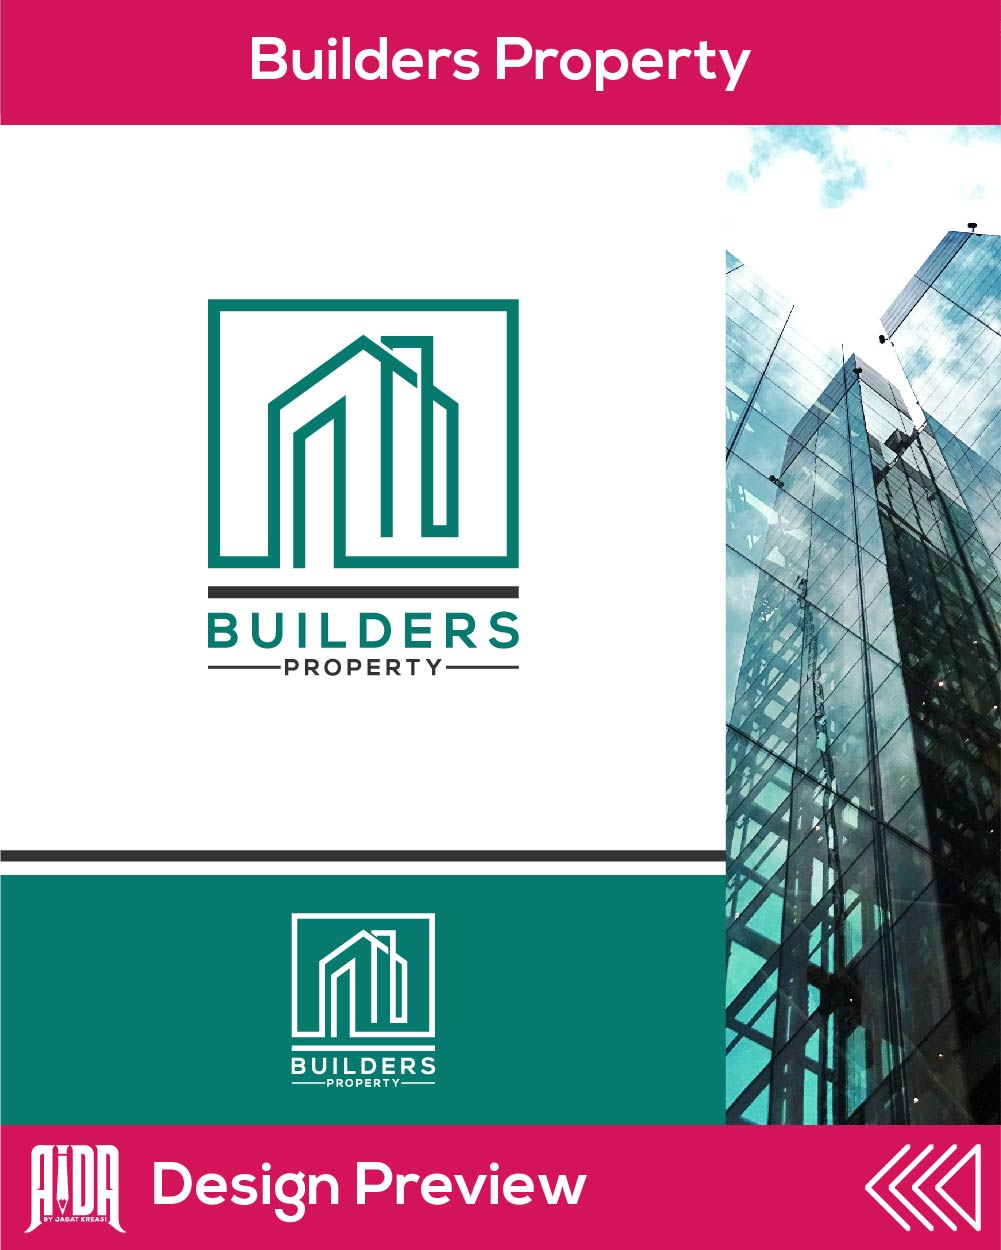 Builder Property